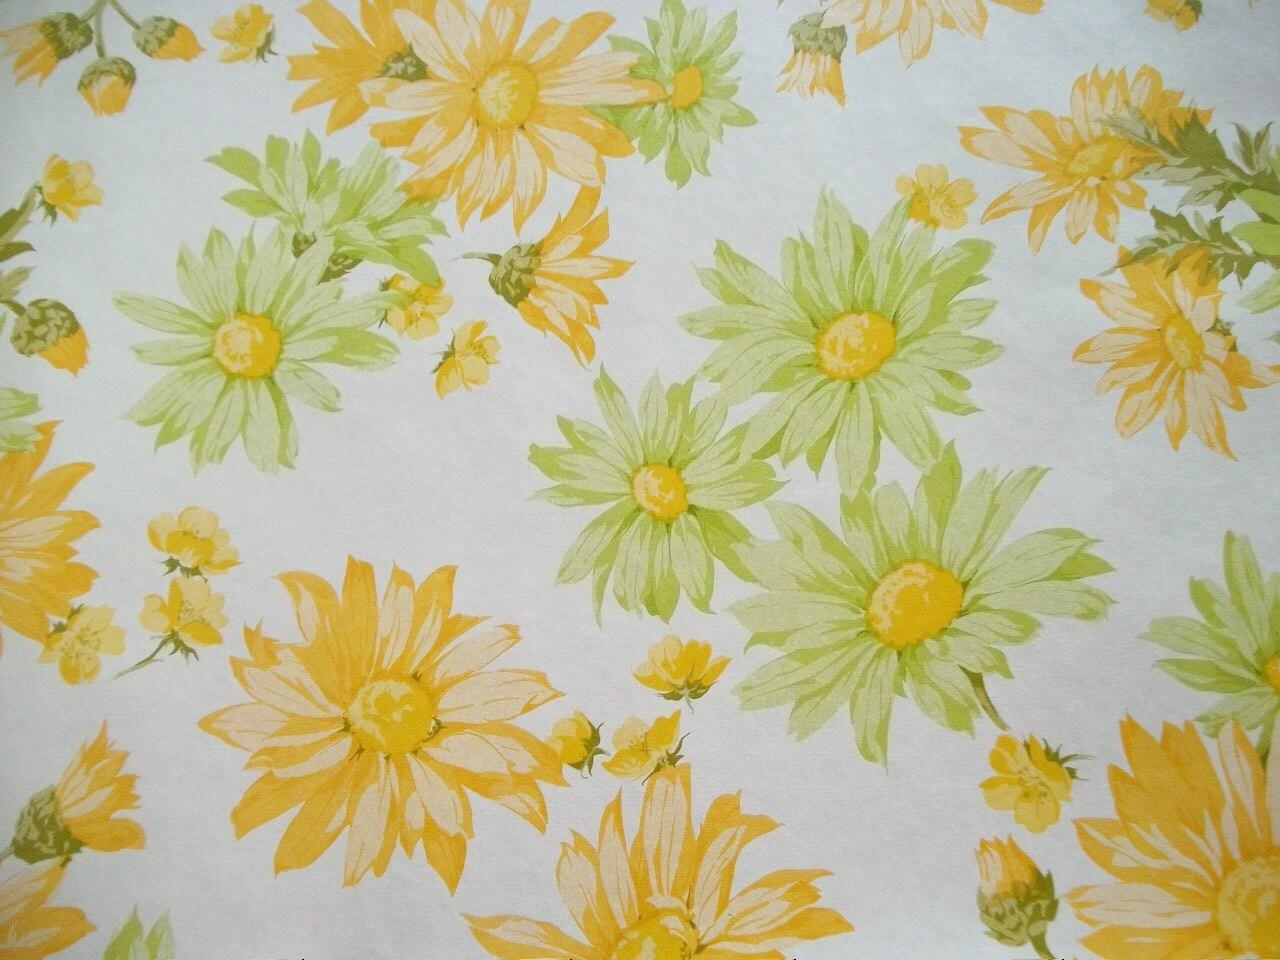 Vintage french sunflower wallpaper sample sheet for Old french wallpaper